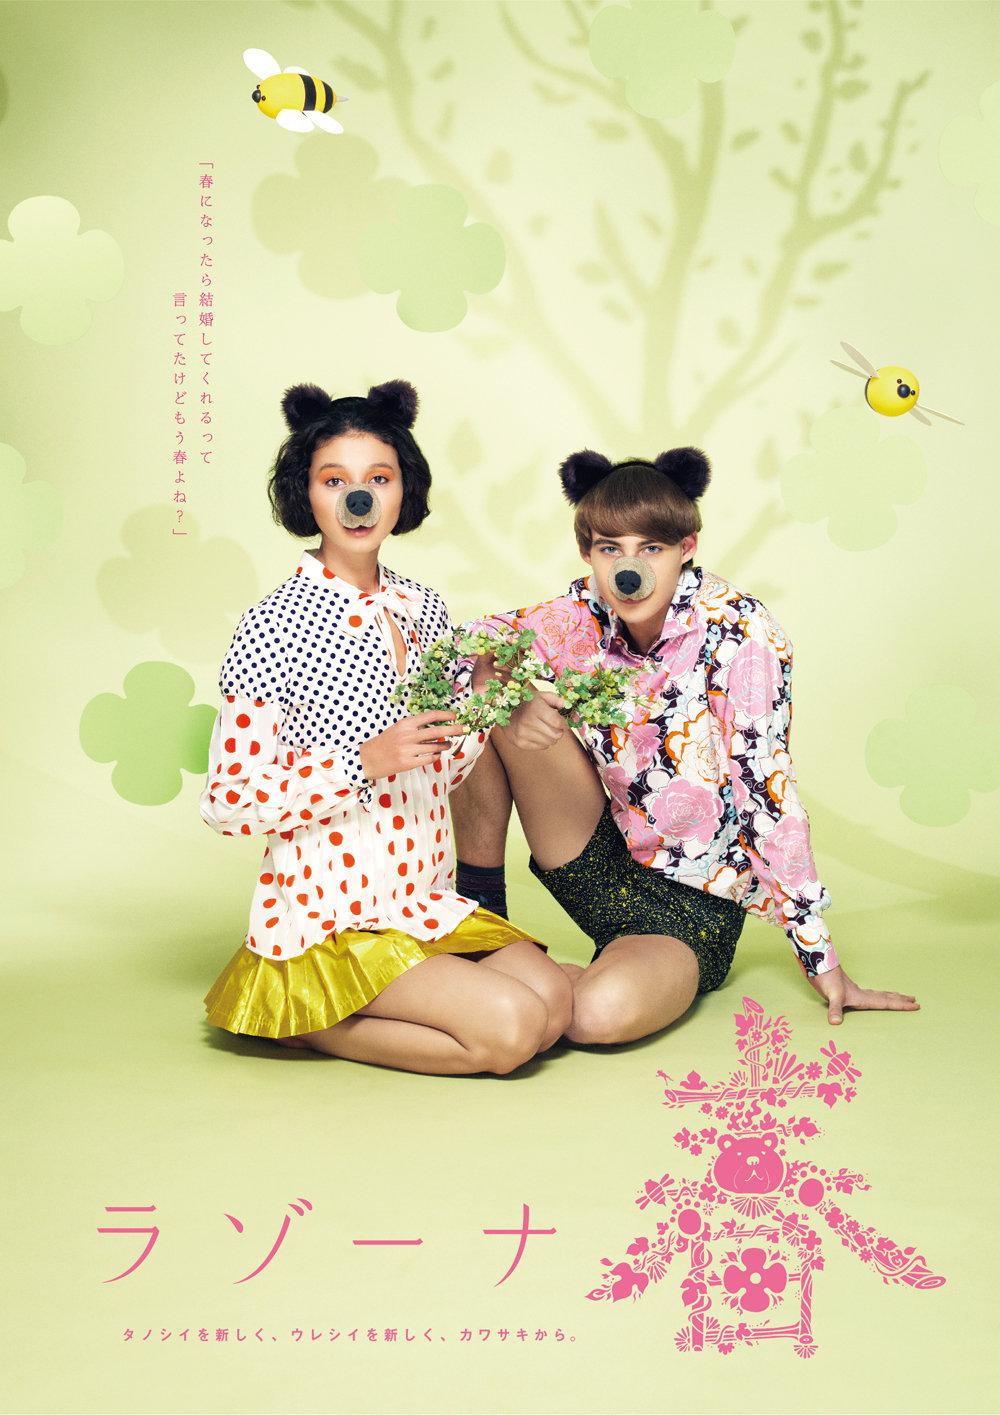 LAZONA_Spring.jpg